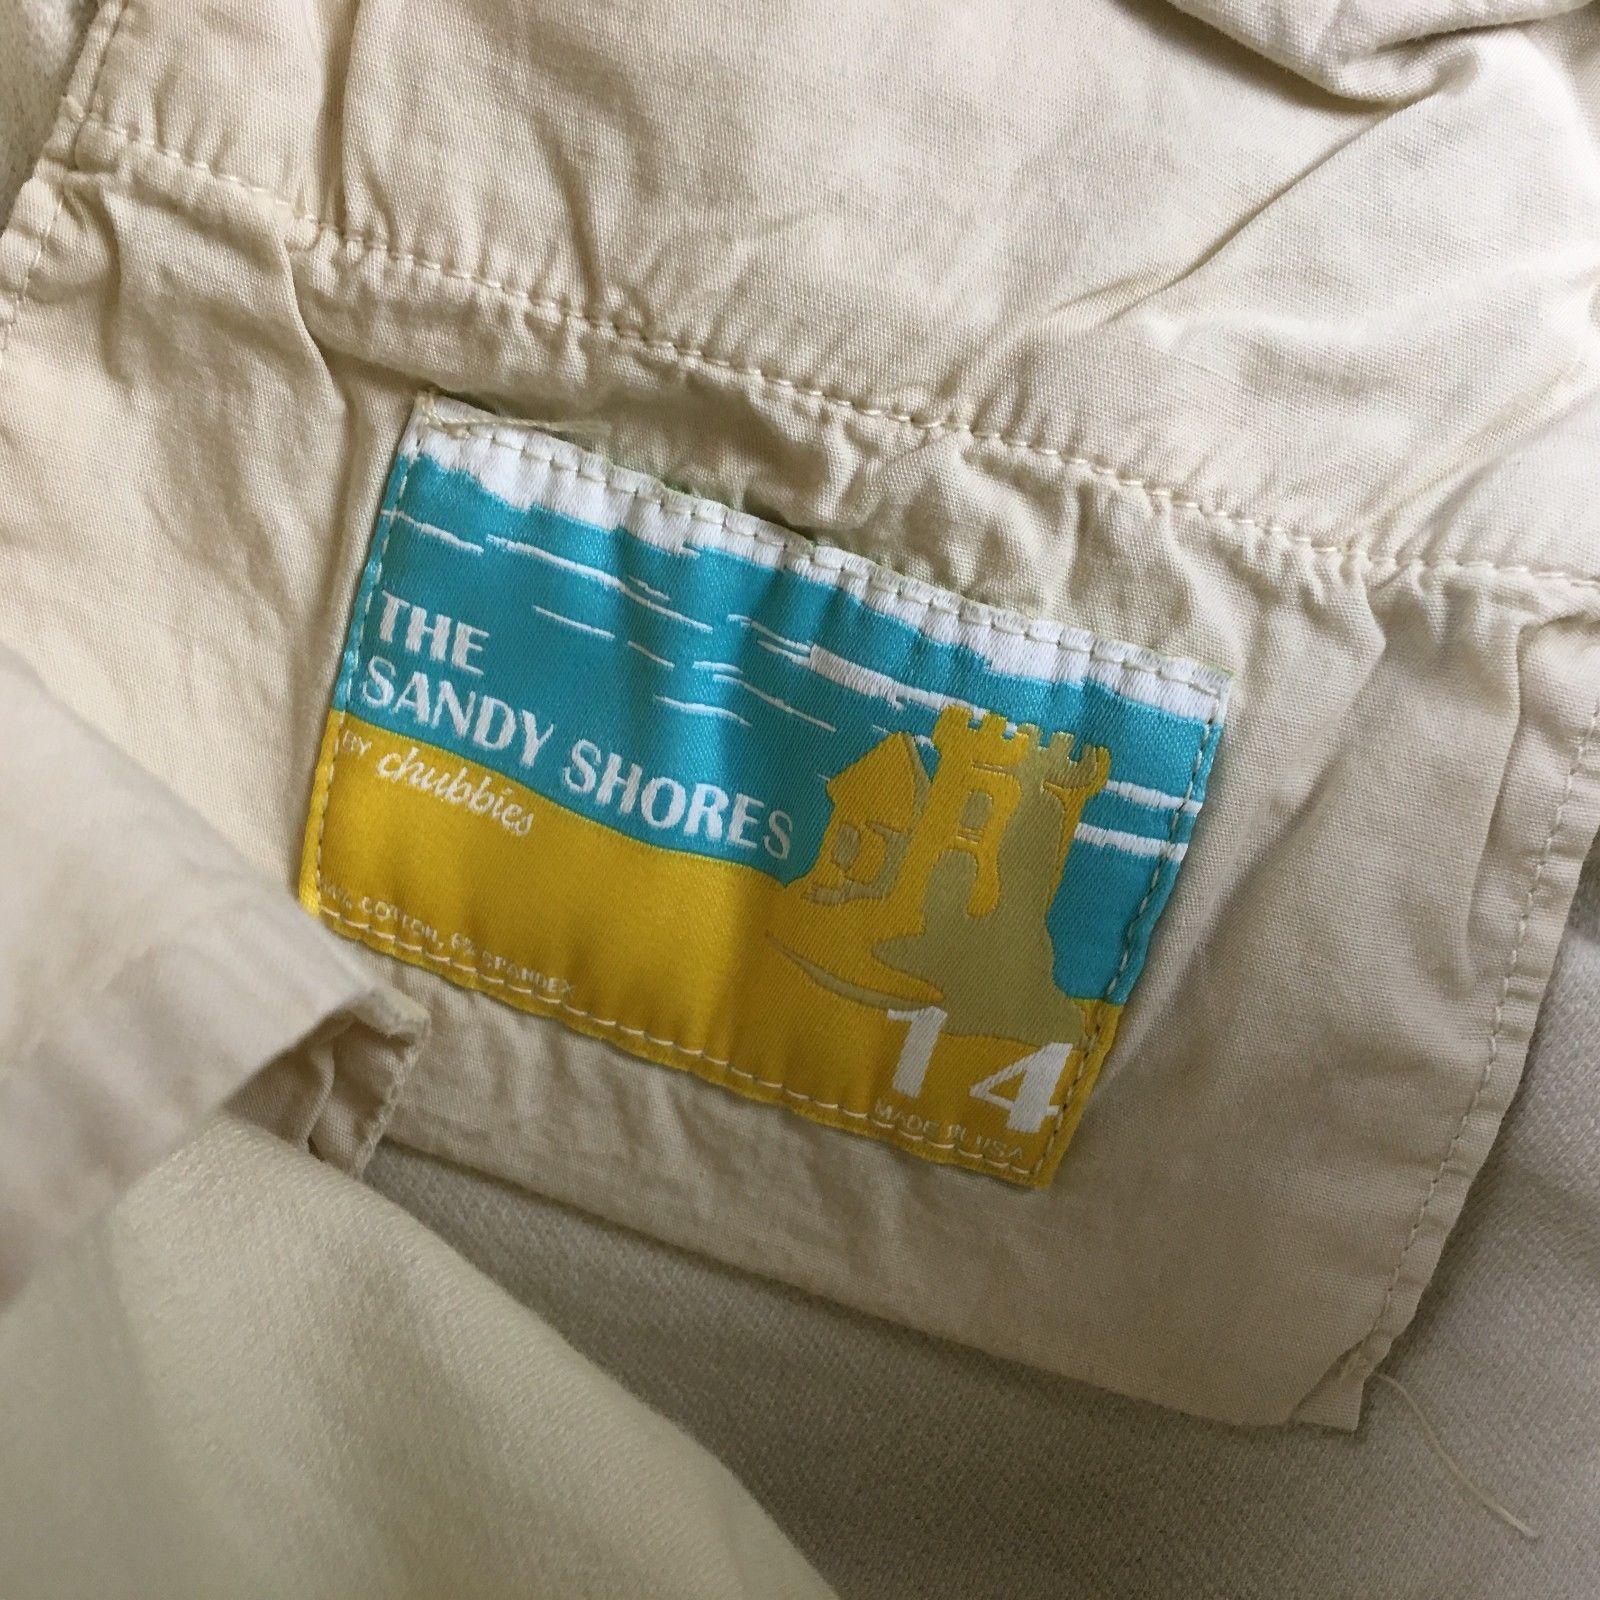 Chubbies Womens White Sandy Shores Shorts Shorts 14 C05:02163